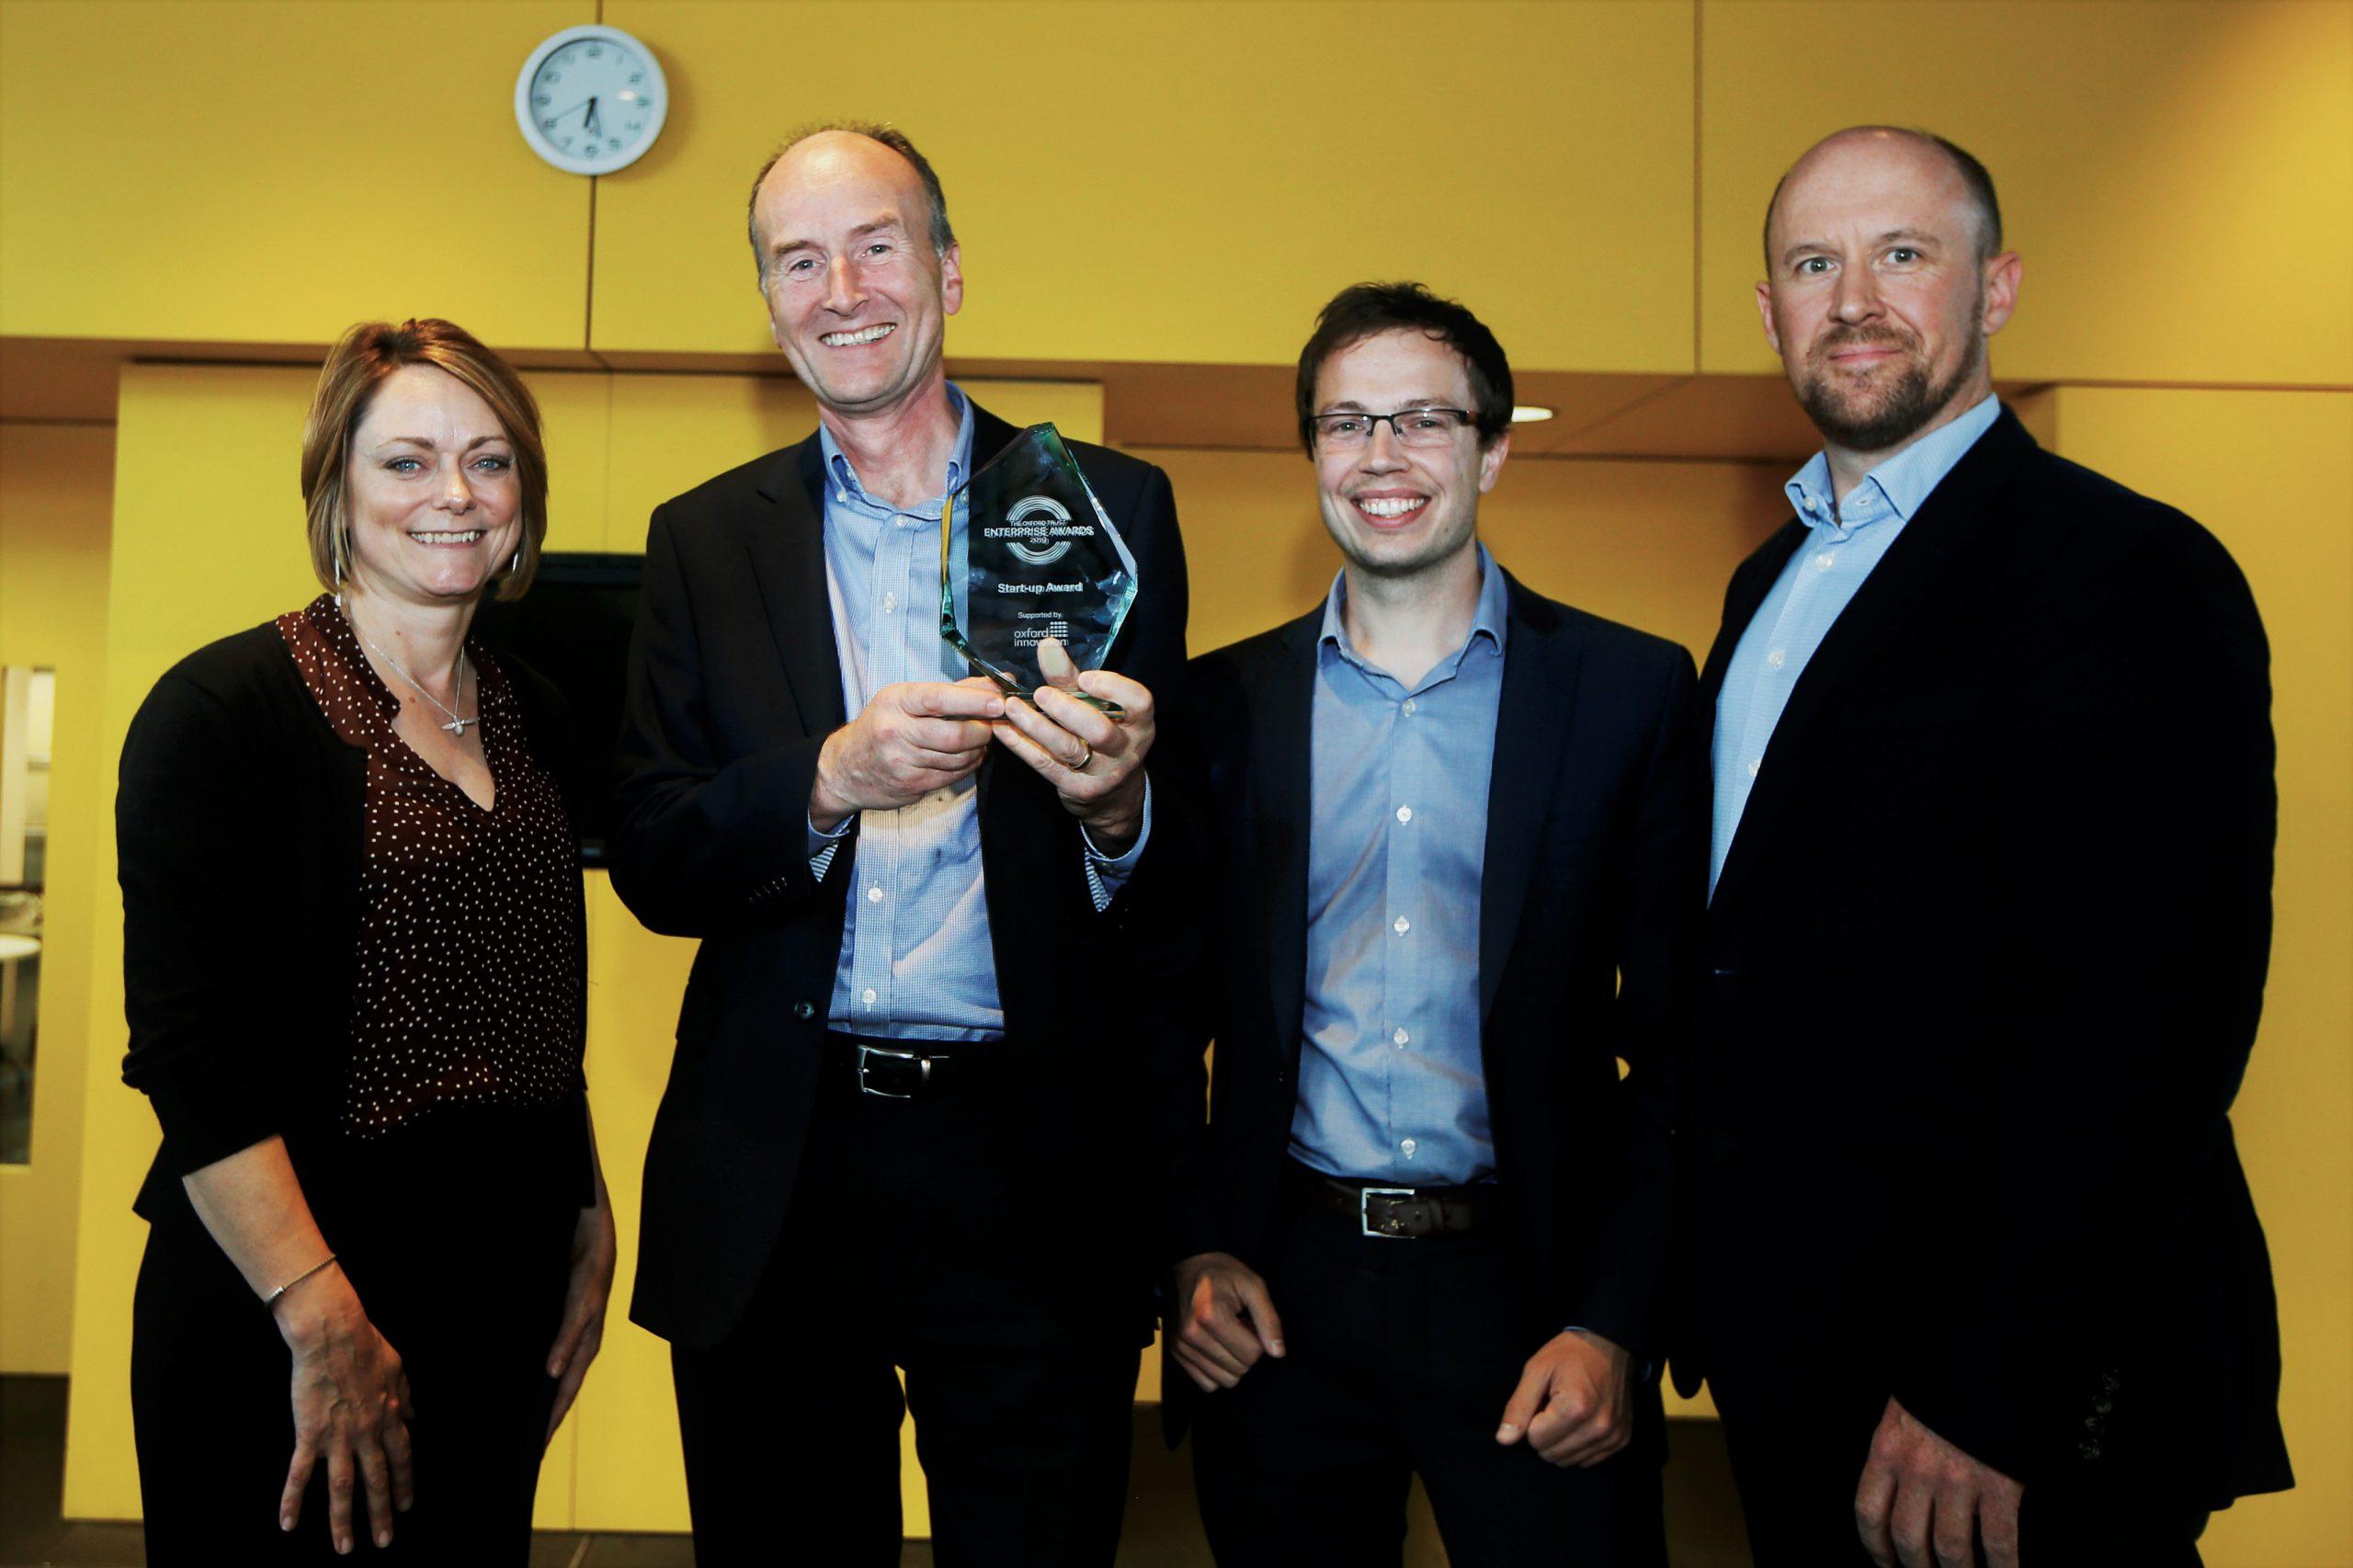 Opsydia Wins Innovation Startup Award